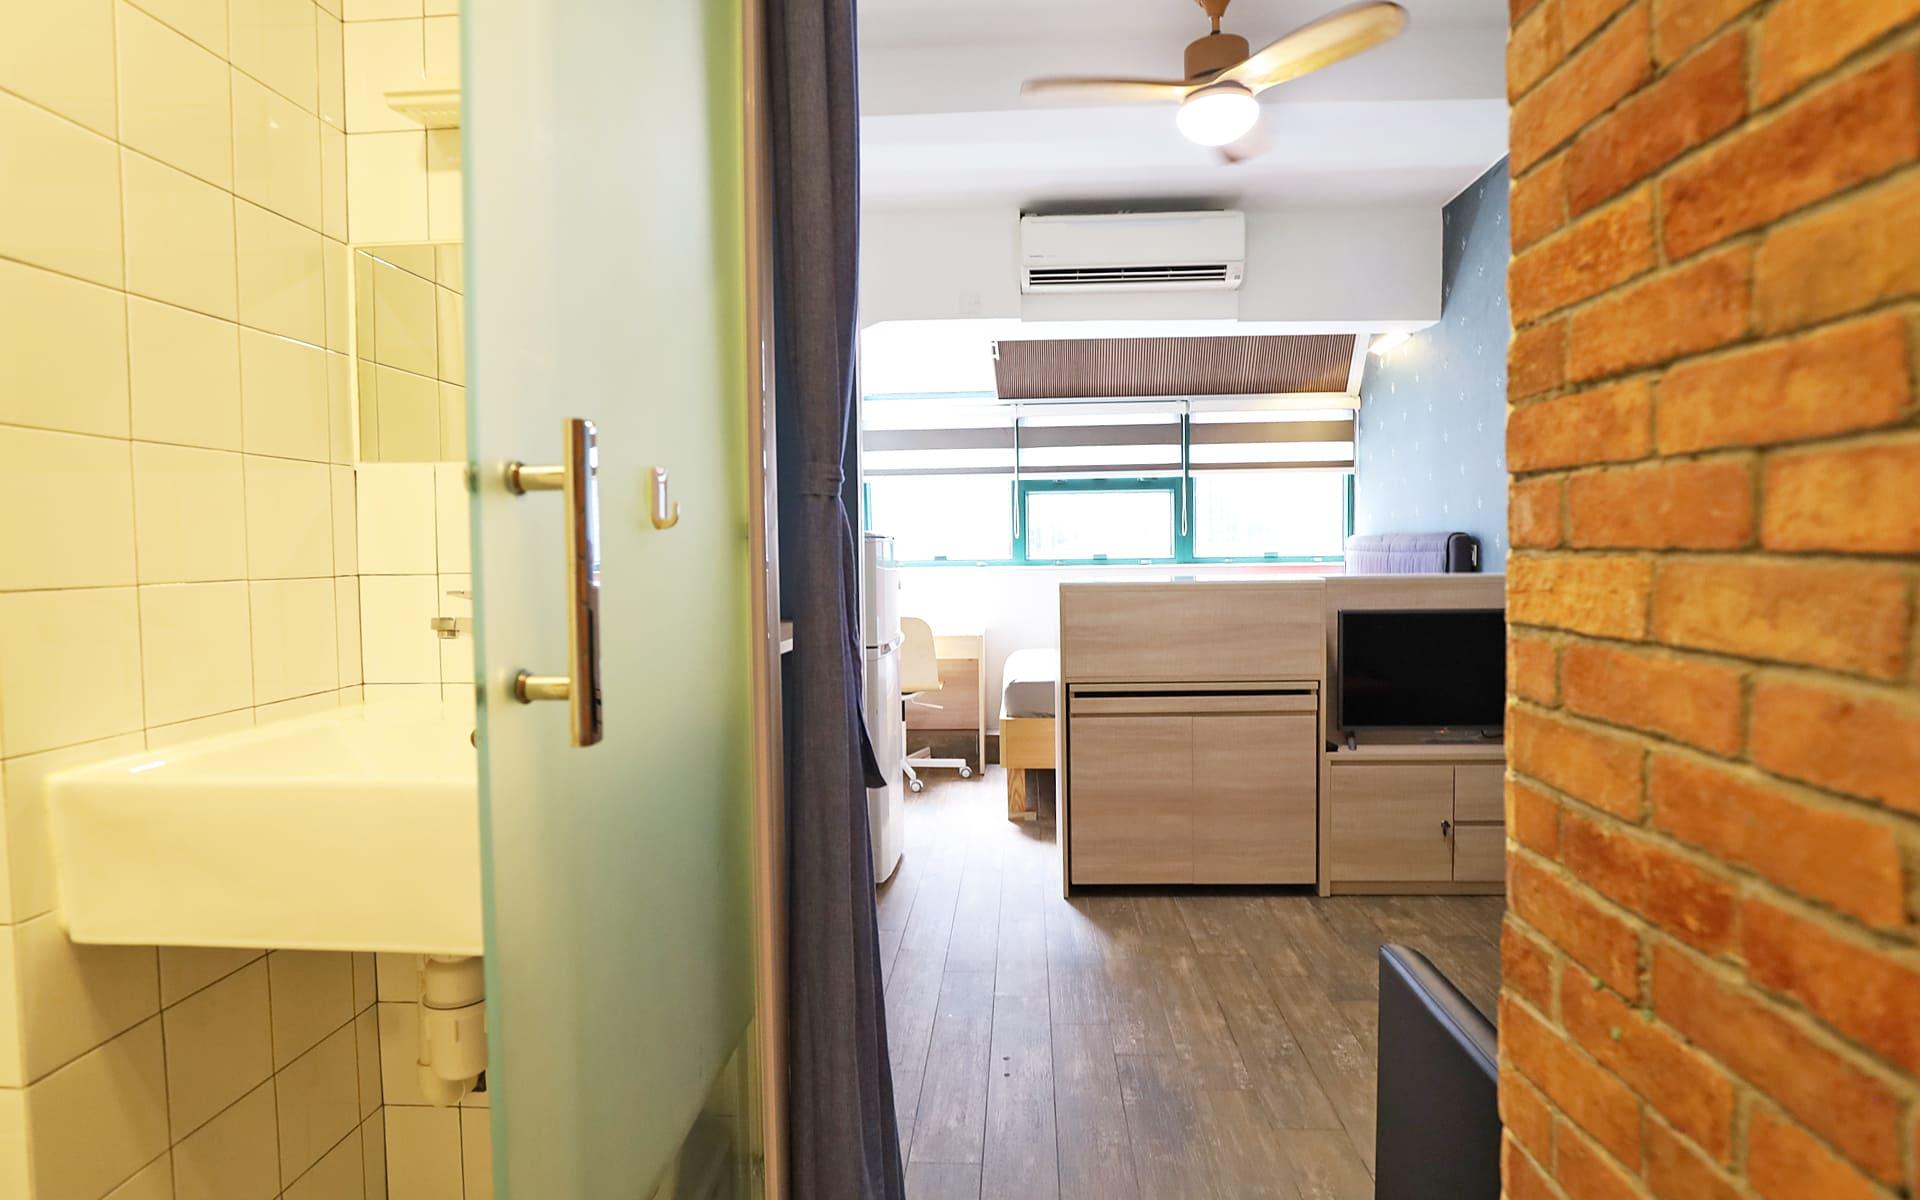 hk_service_apartment_20749479841591179359.jpg